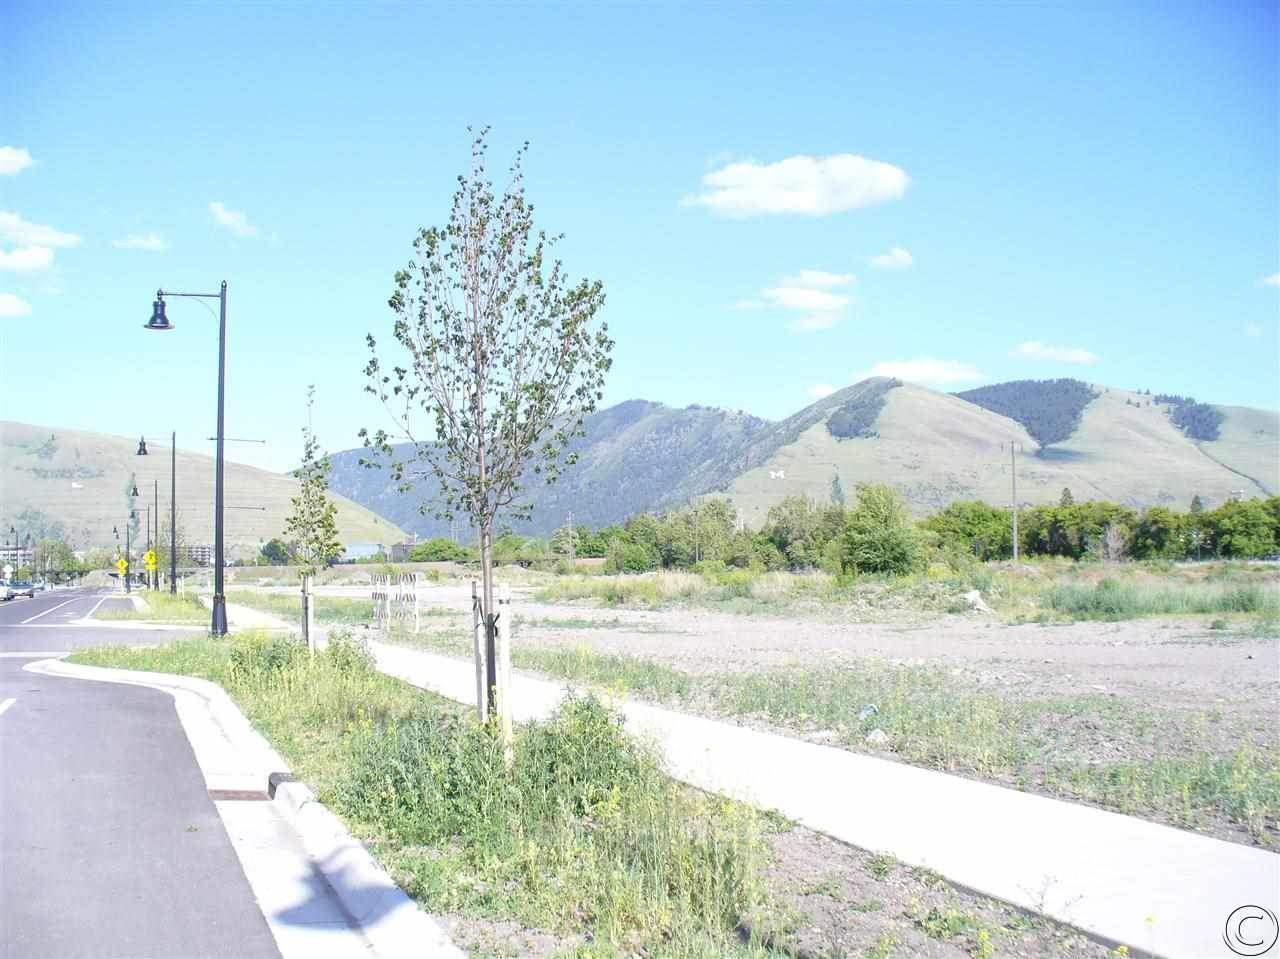 Nhn Wyoming Street, Missoula, MT 59801